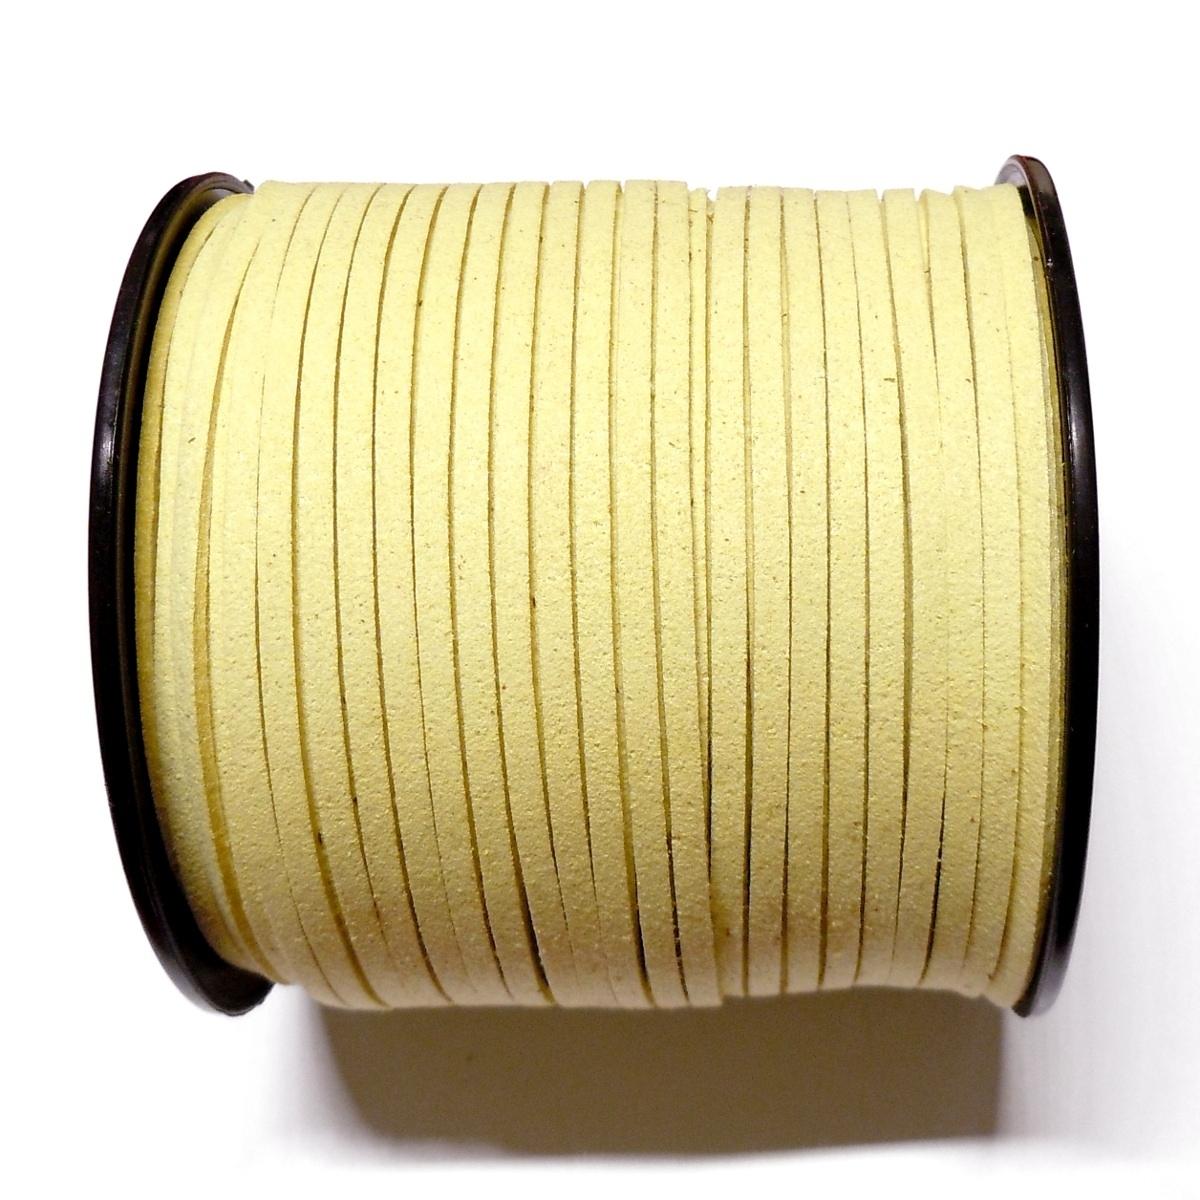 Imitation Flat Suede Cord 3mm - Light Yellow 31